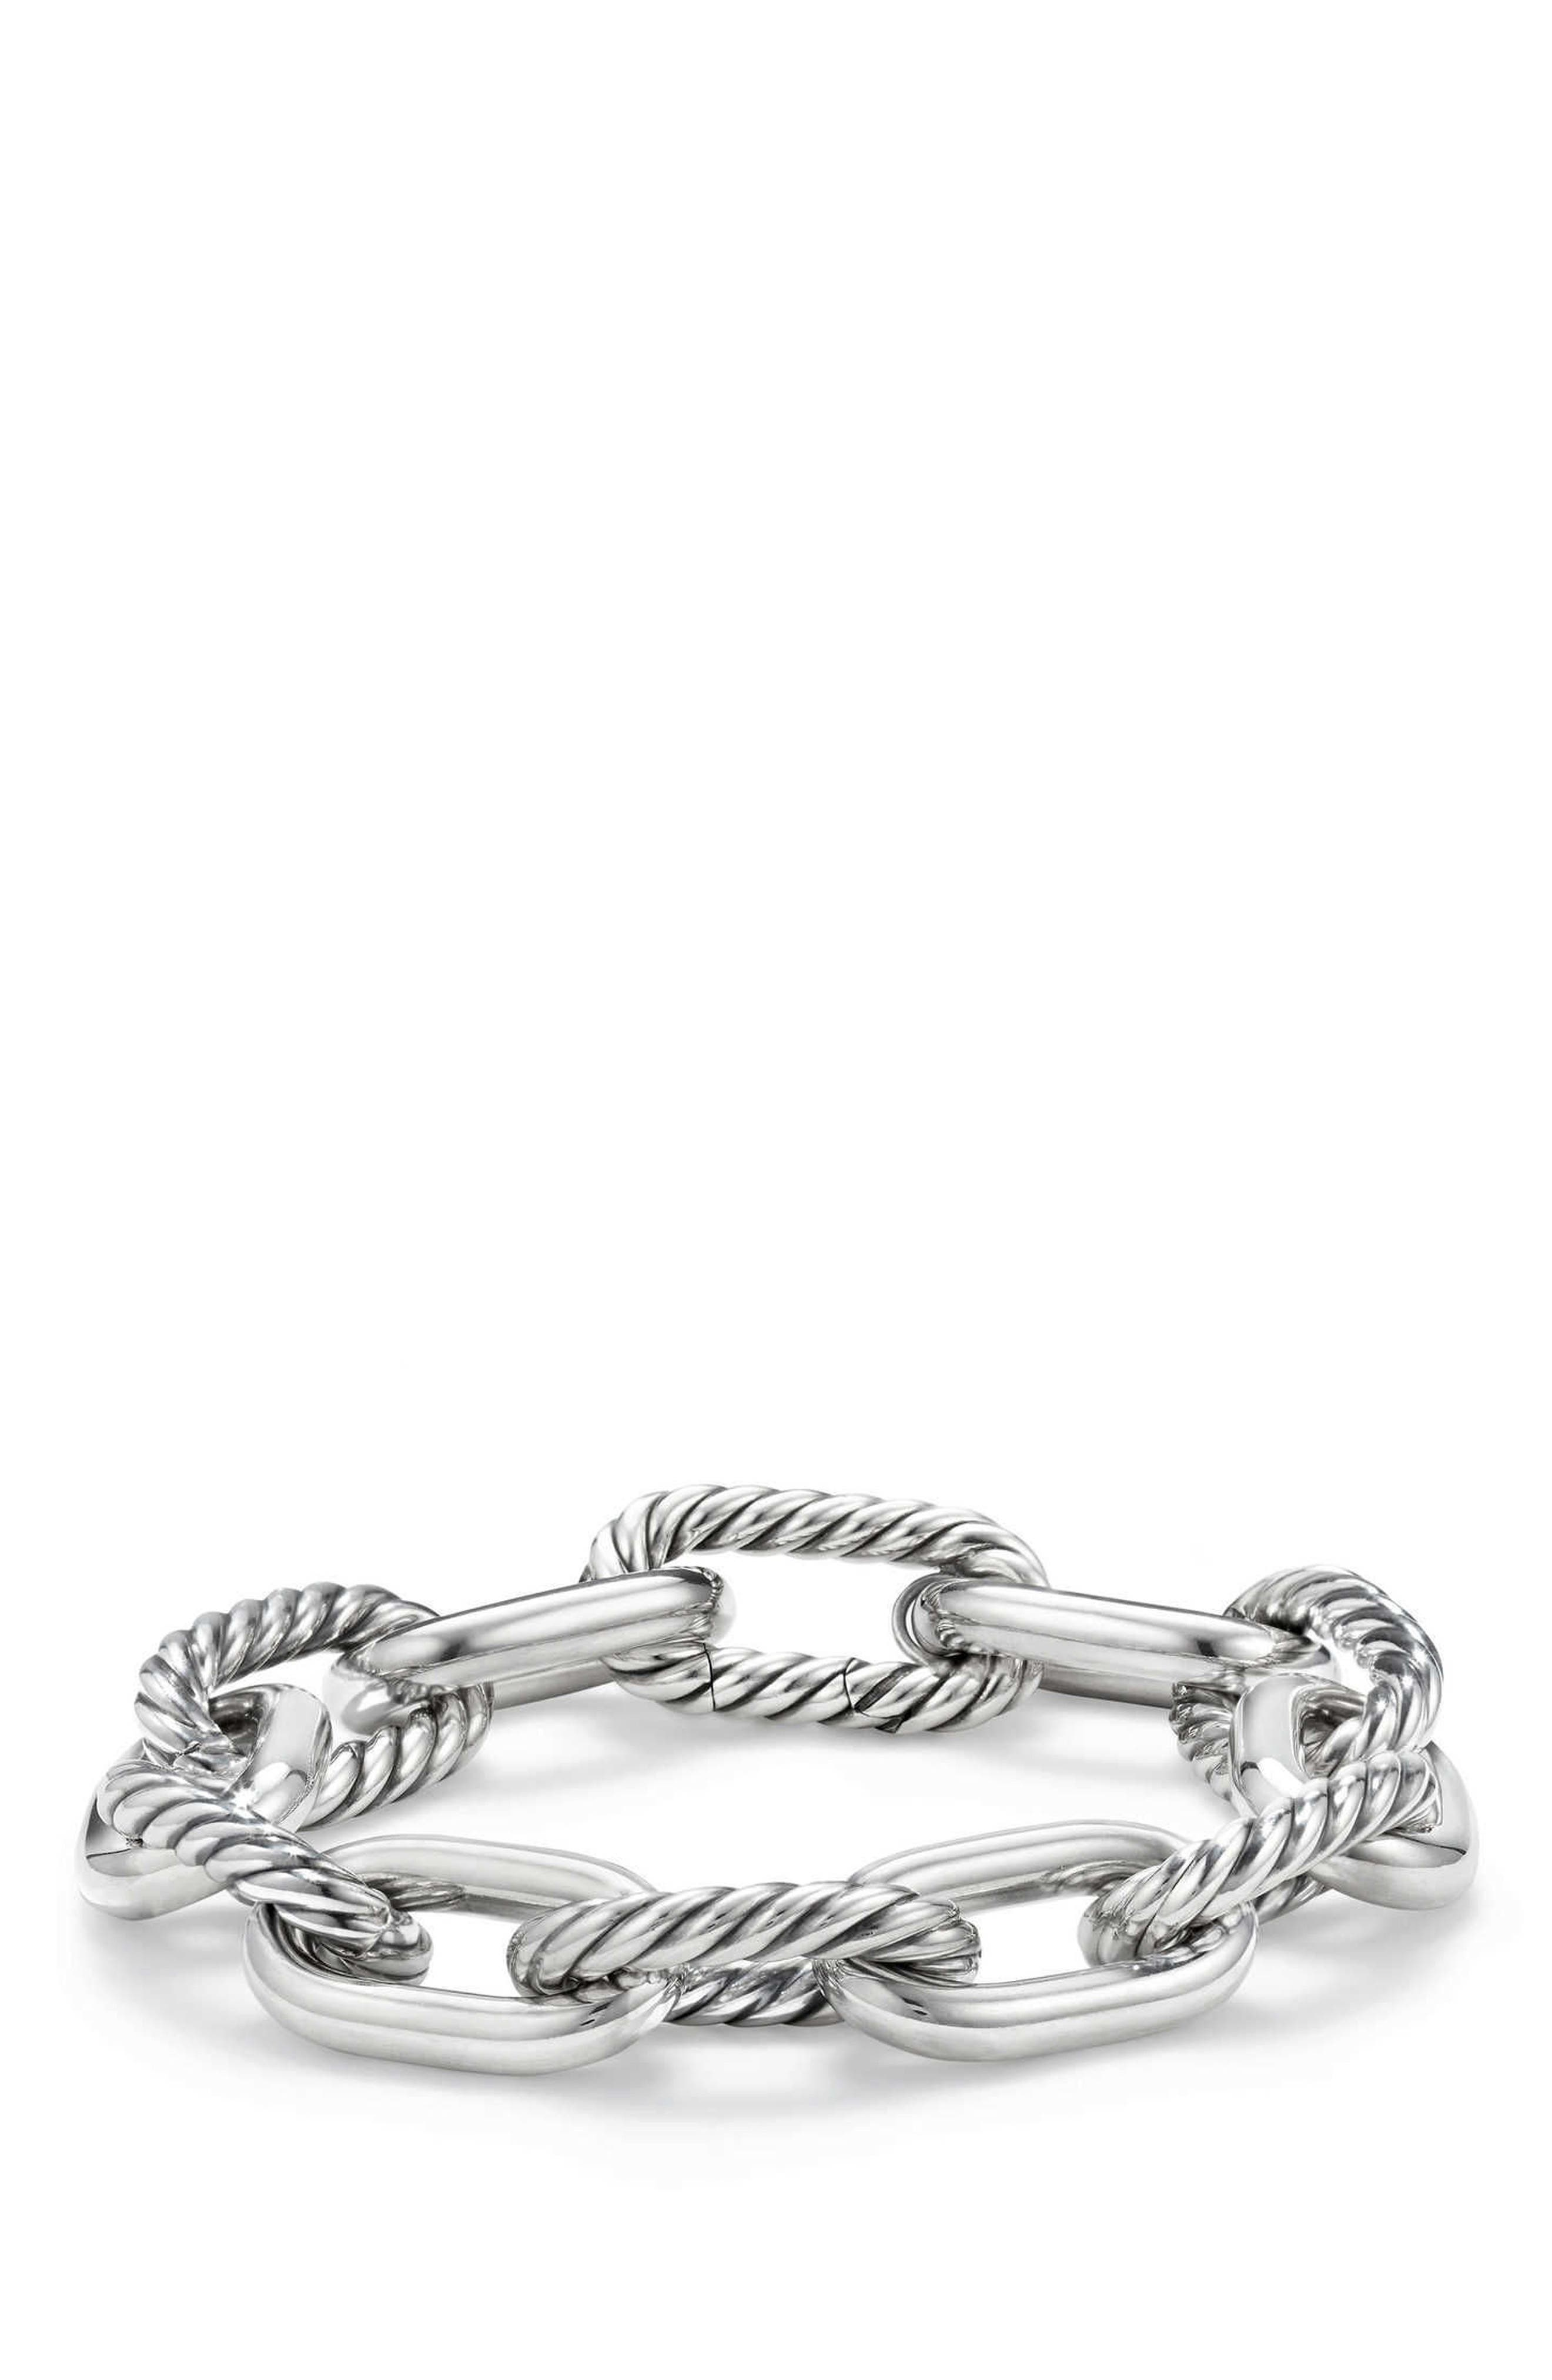 DY Madison Chain Large Bracelet,                             Main thumbnail 1, color,                             Silver